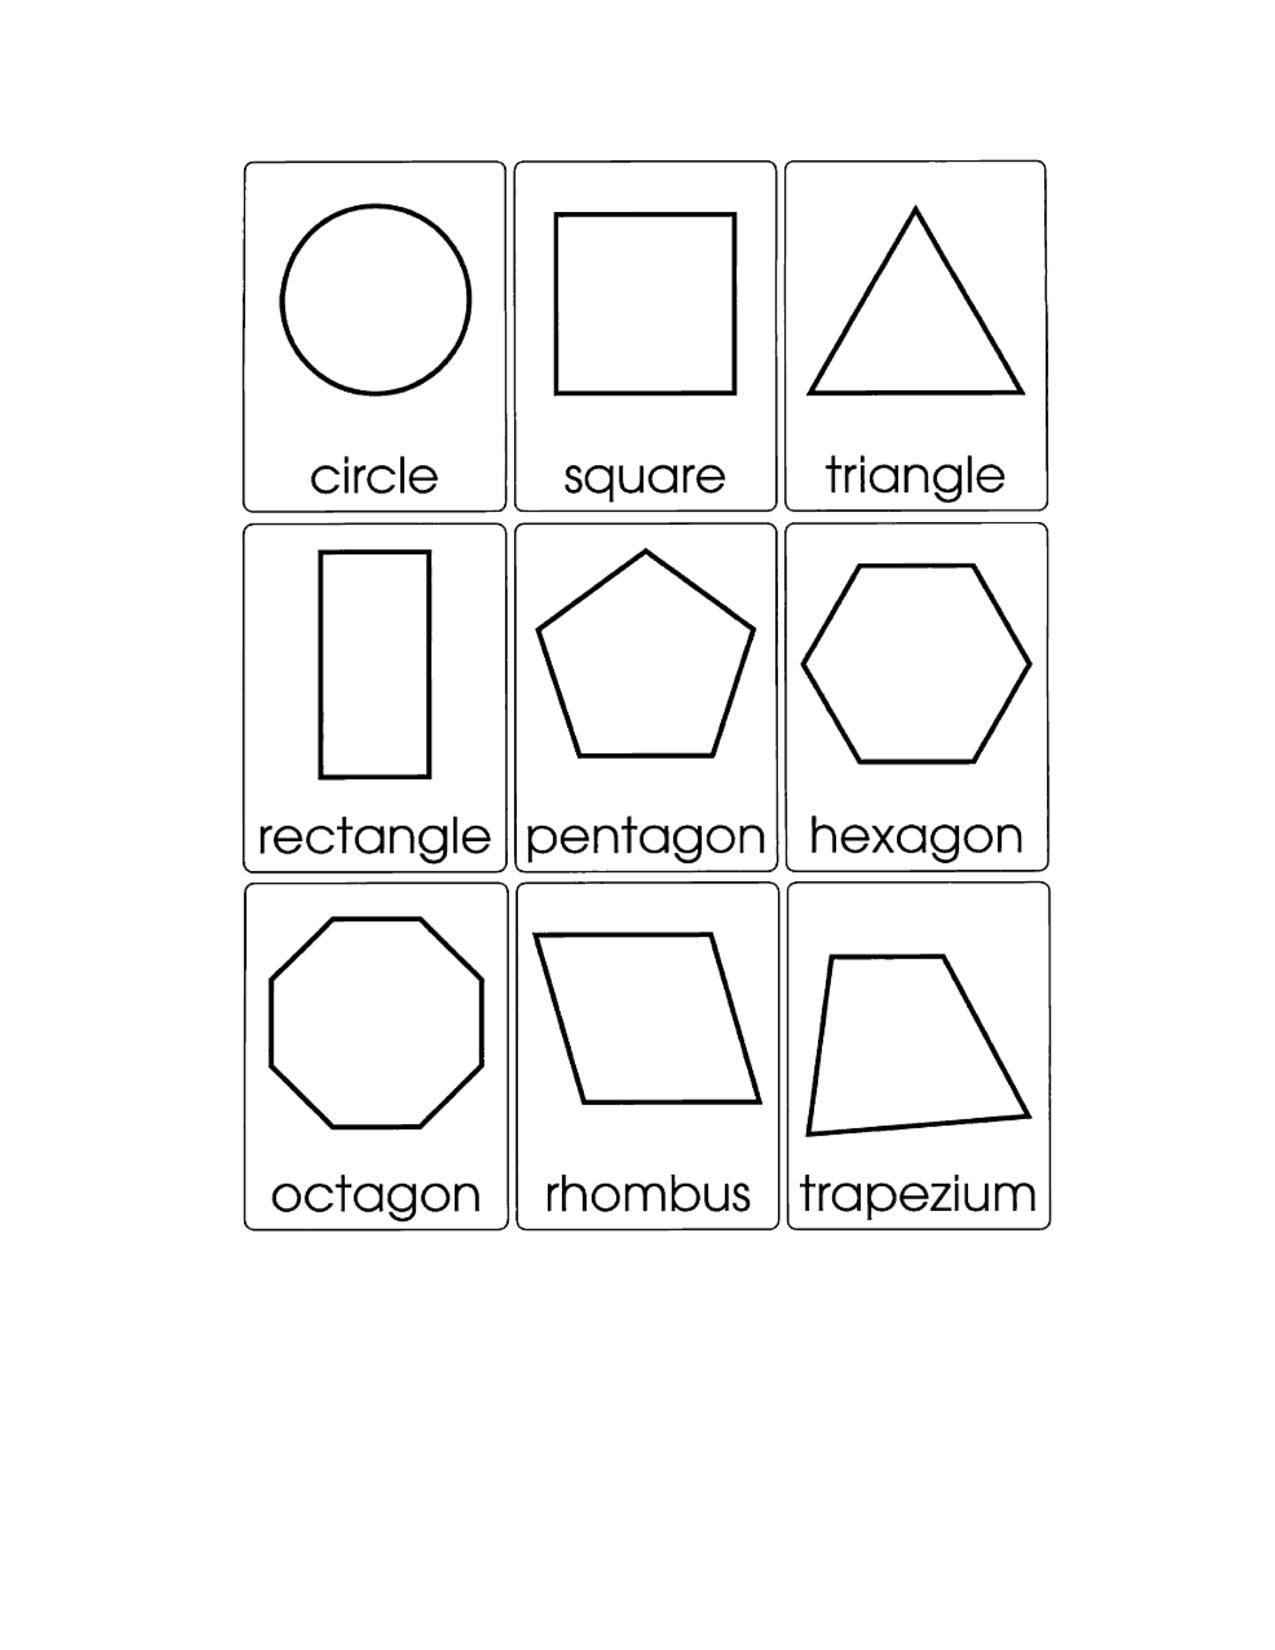 2d shape cards - Google Search | Math | Pinterest | Shaped cards ...